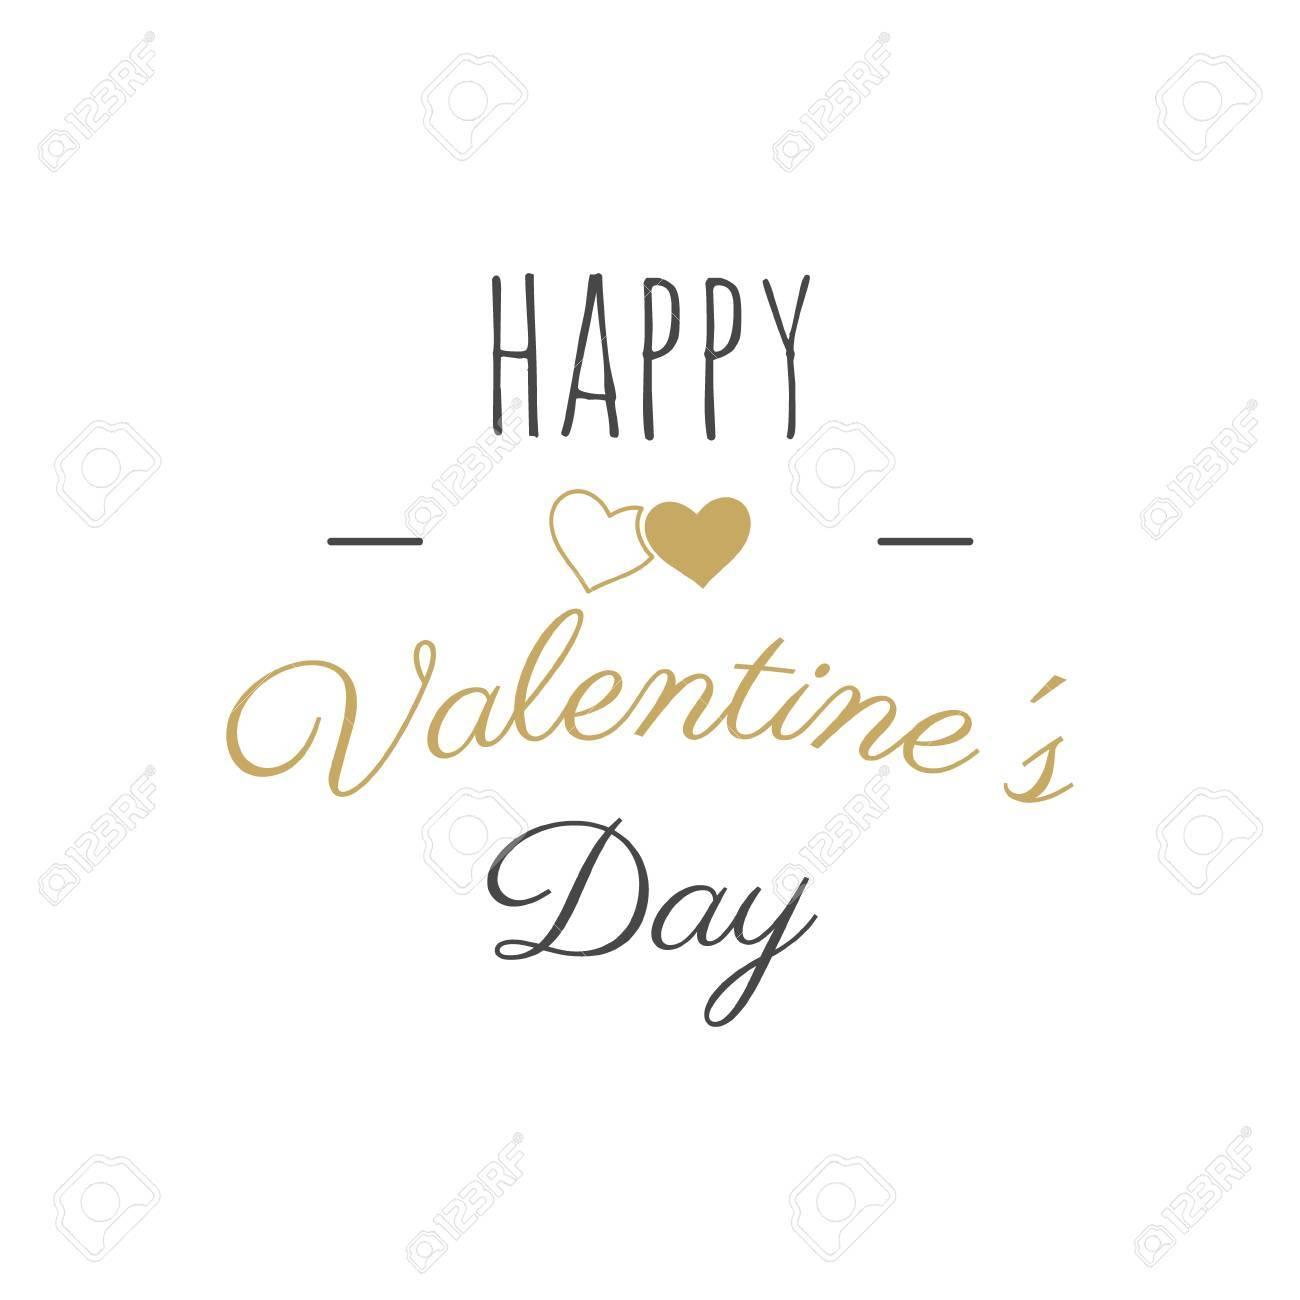 17+ Valentine's Day Badges & Overlays PNG